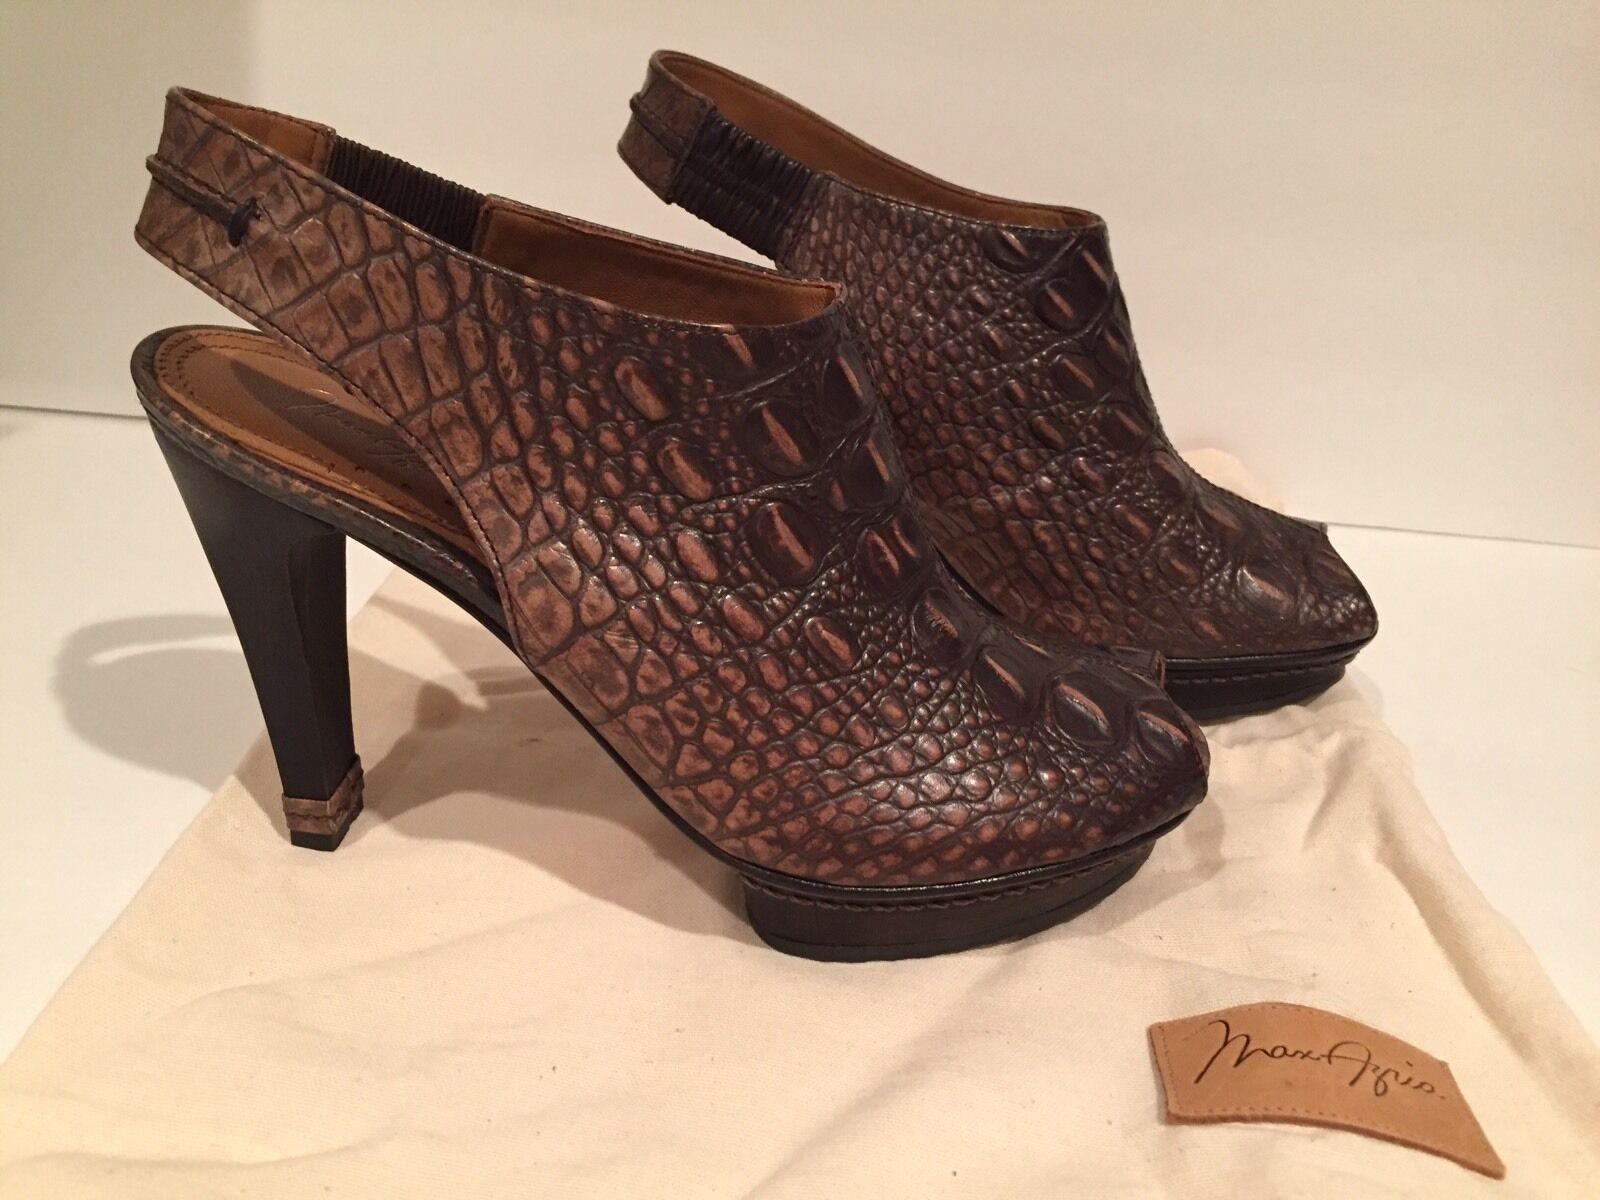 Max Azria Sandals Open Toe Leather Crocodile Slingbacks Brown 39.5 9 BCBG New